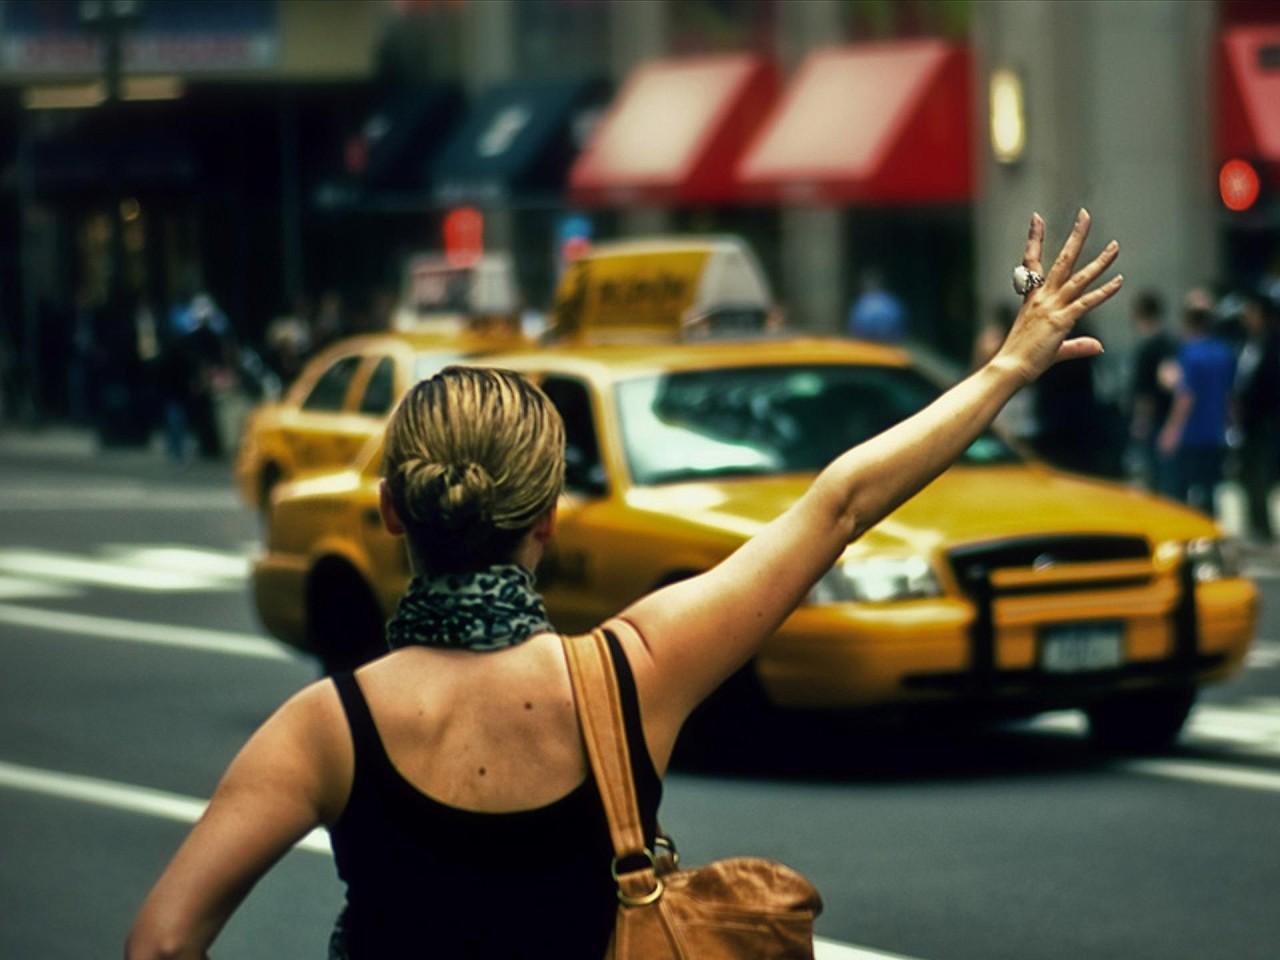 Жена таксиста.... Улыбнемся))